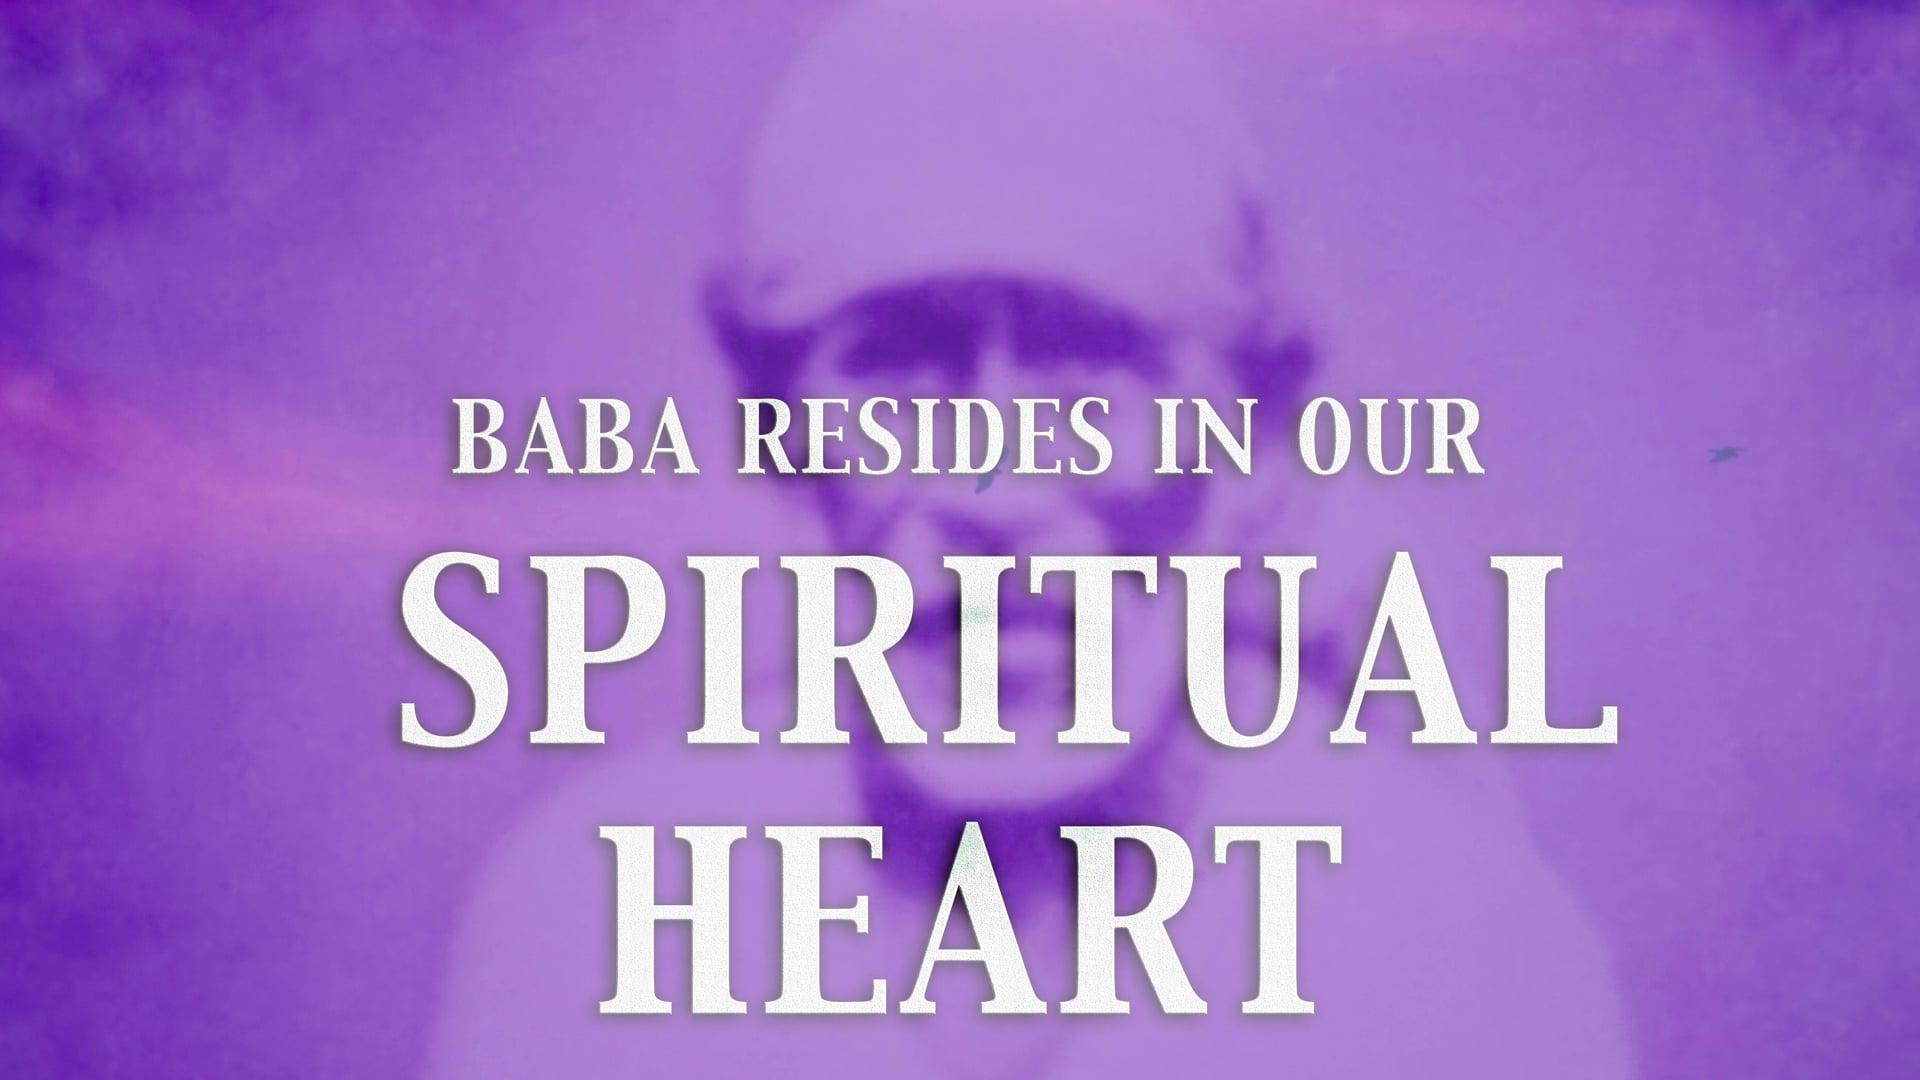 Sai Baba Resides in Our Spiritual Heart